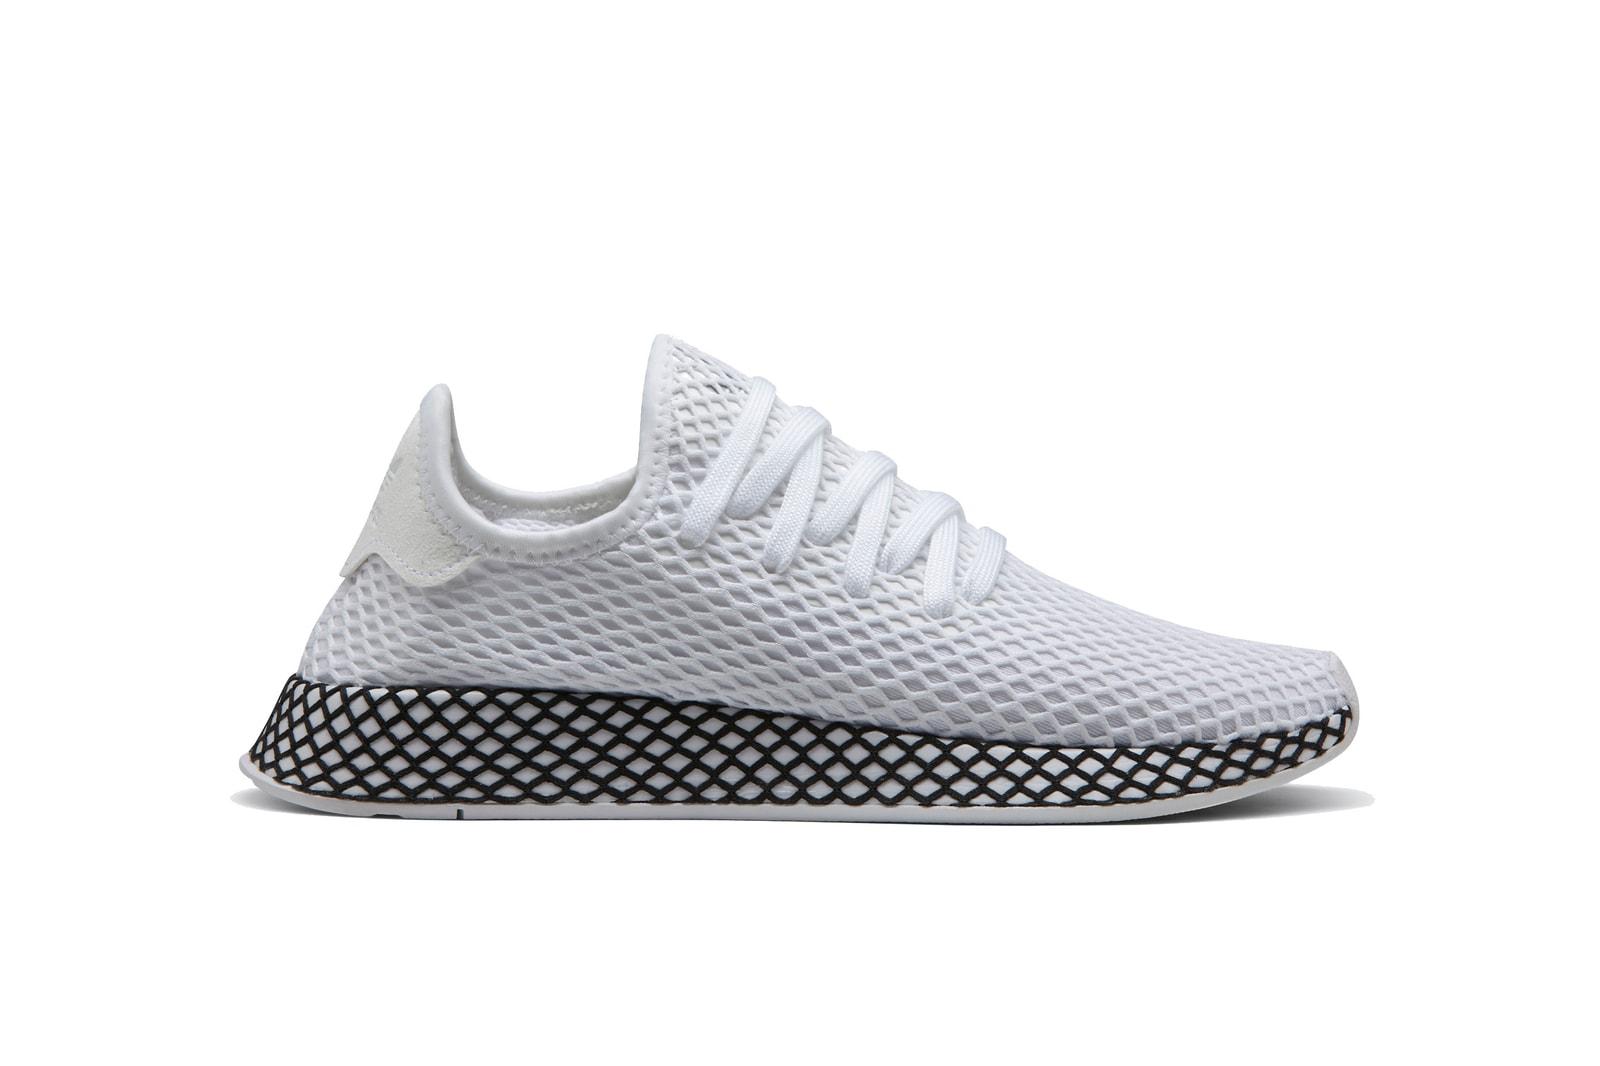 watch a99a0 ba152 adidas Originals Deerupt Six New Colorways Pink Blue White Black Green  Footwear Trainer Shoe